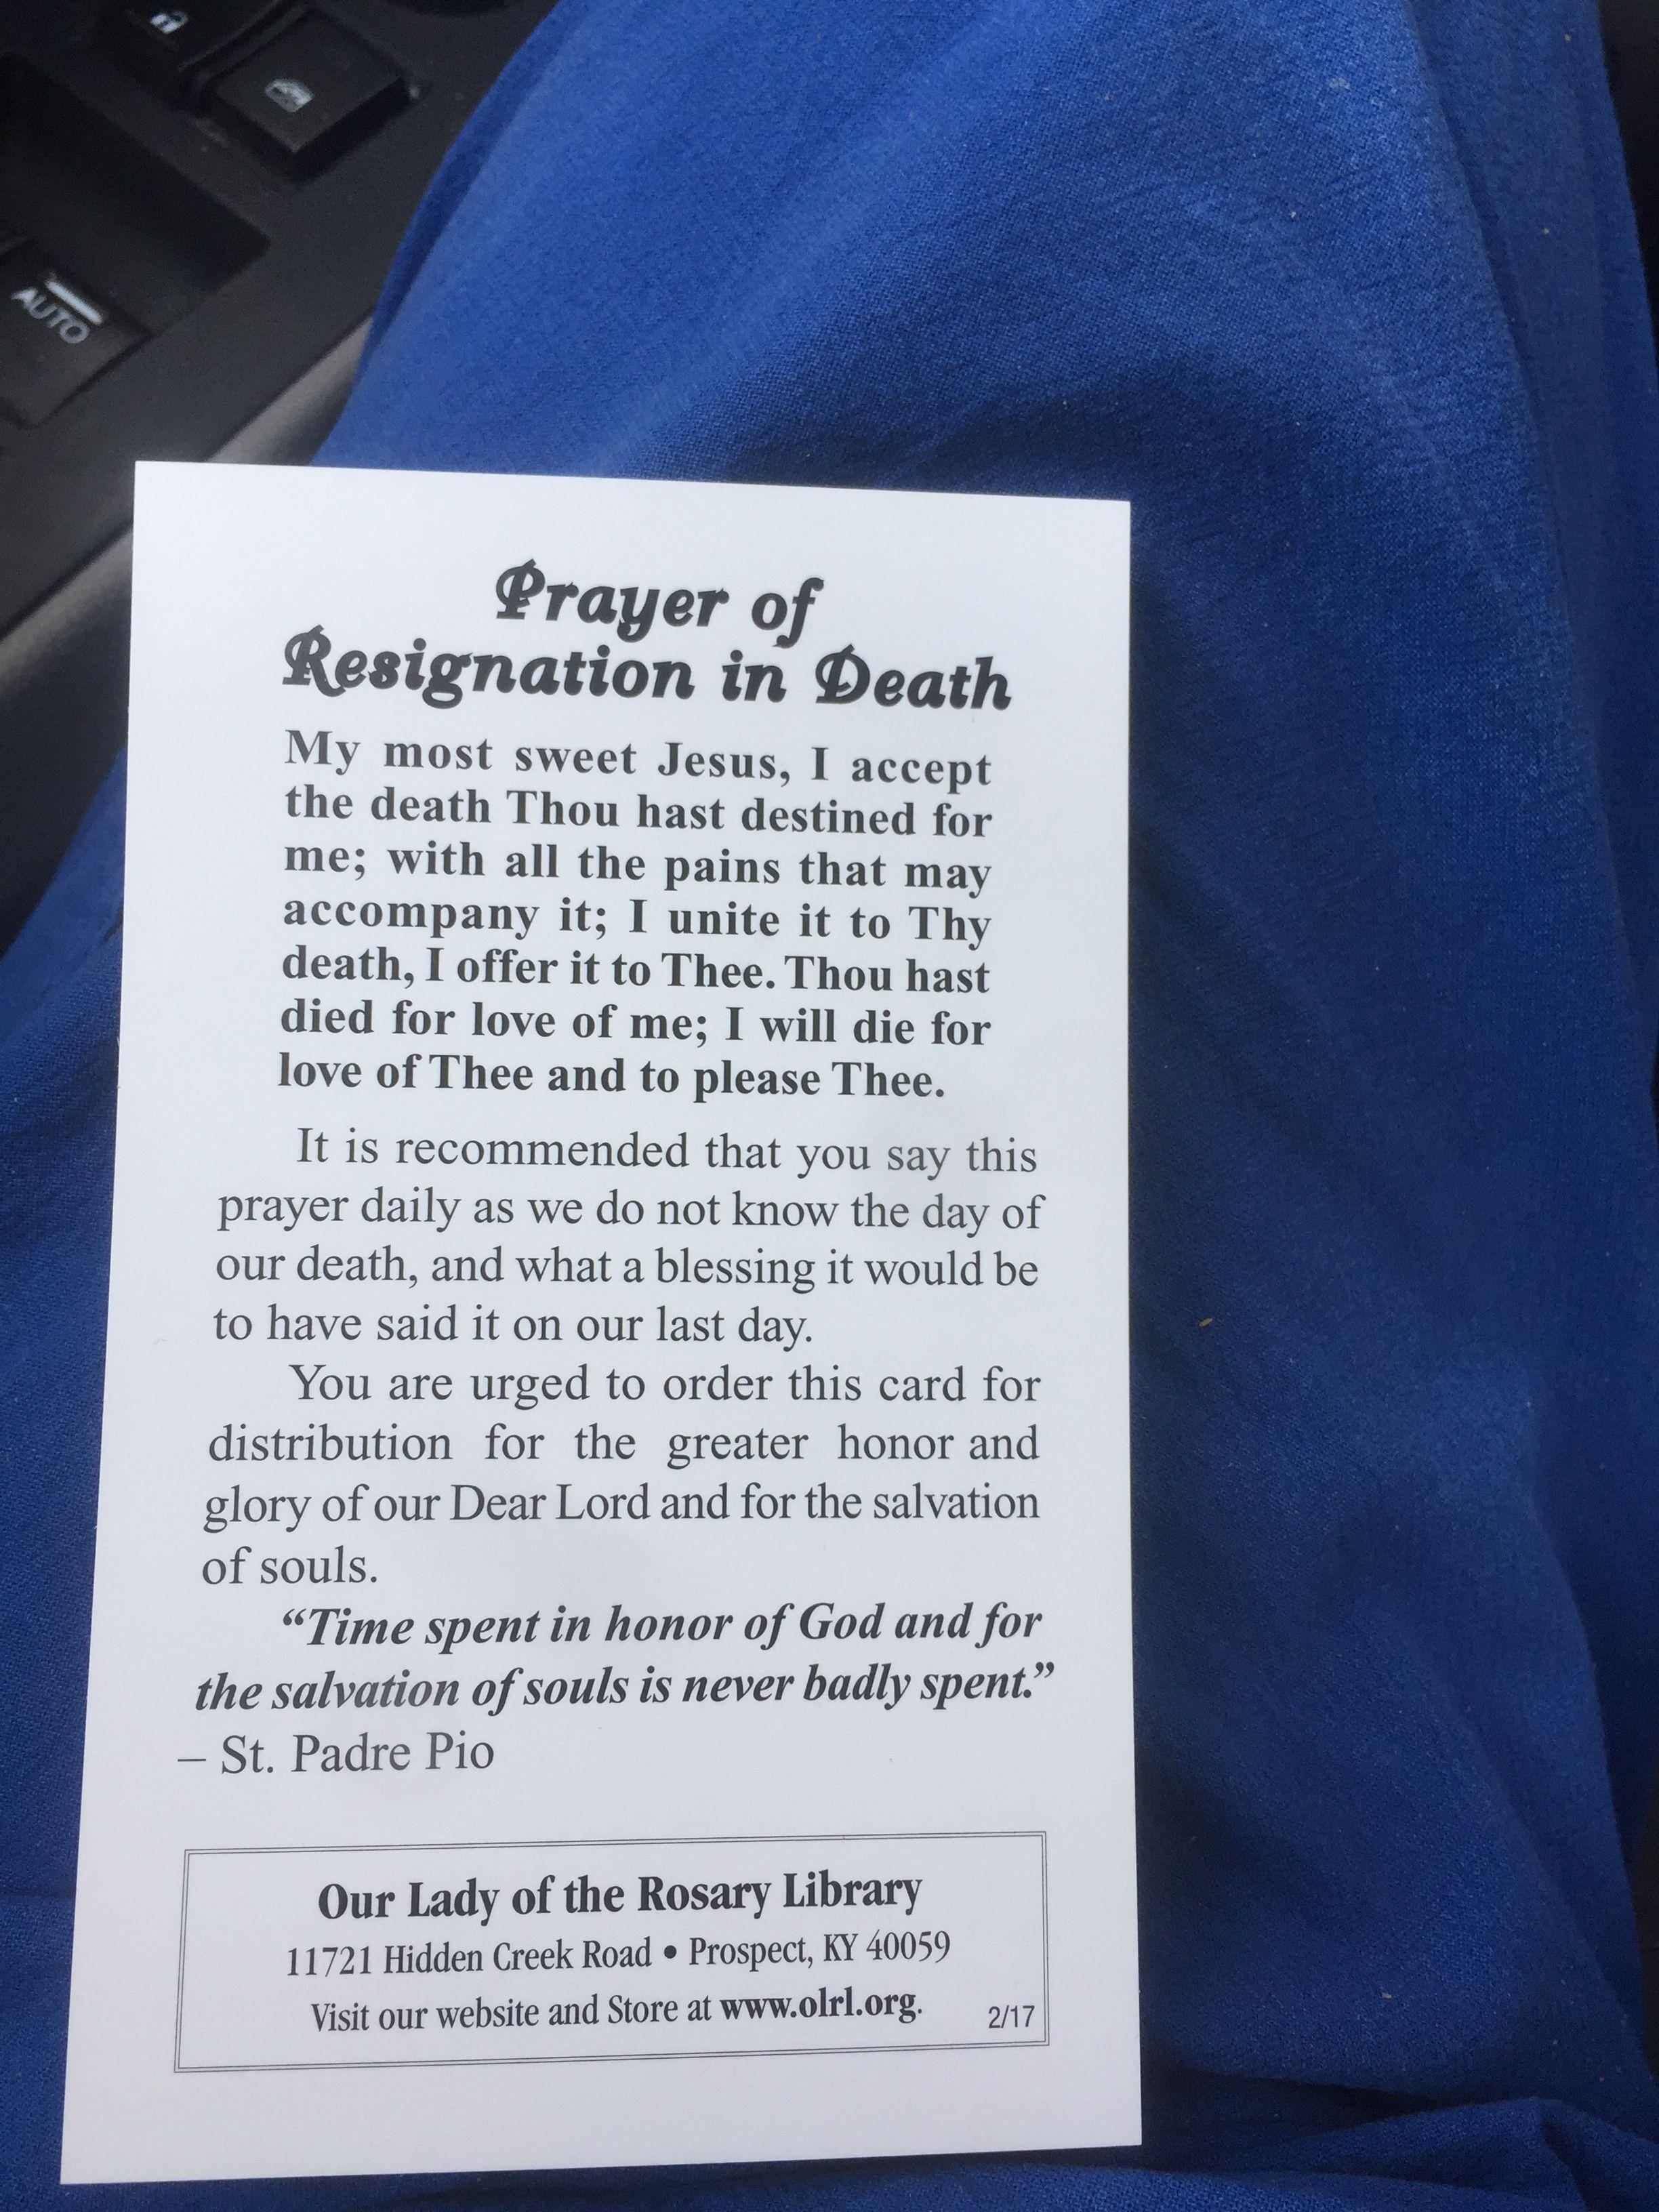 Pin by Maryanne on Basic Catholic Prayers Daily prayer